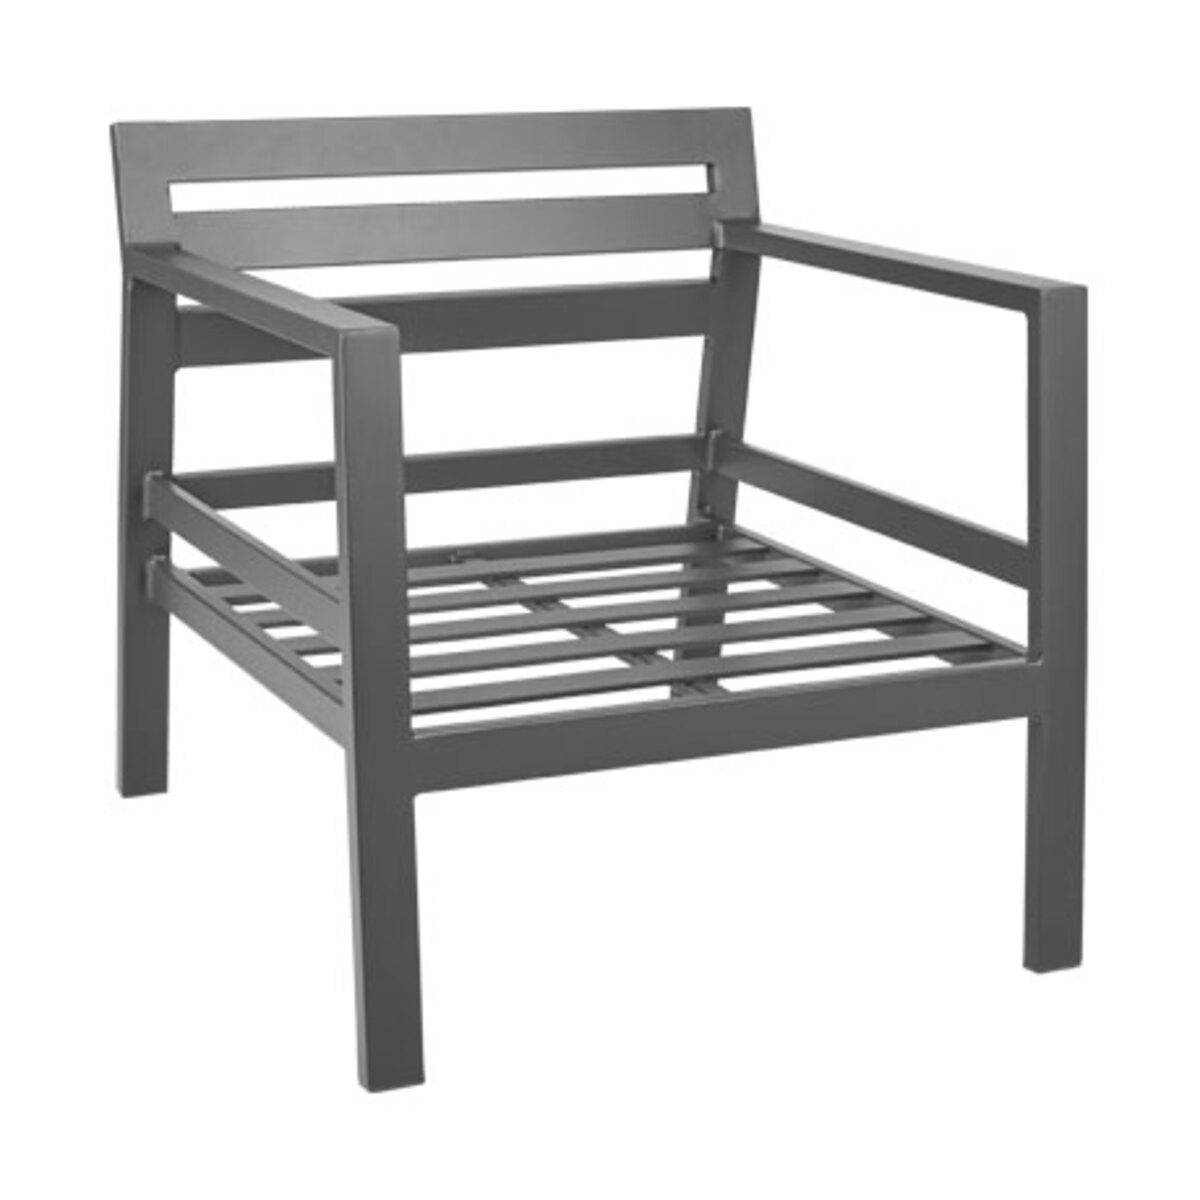 Bild 3 von Aluminium-Garten-Set